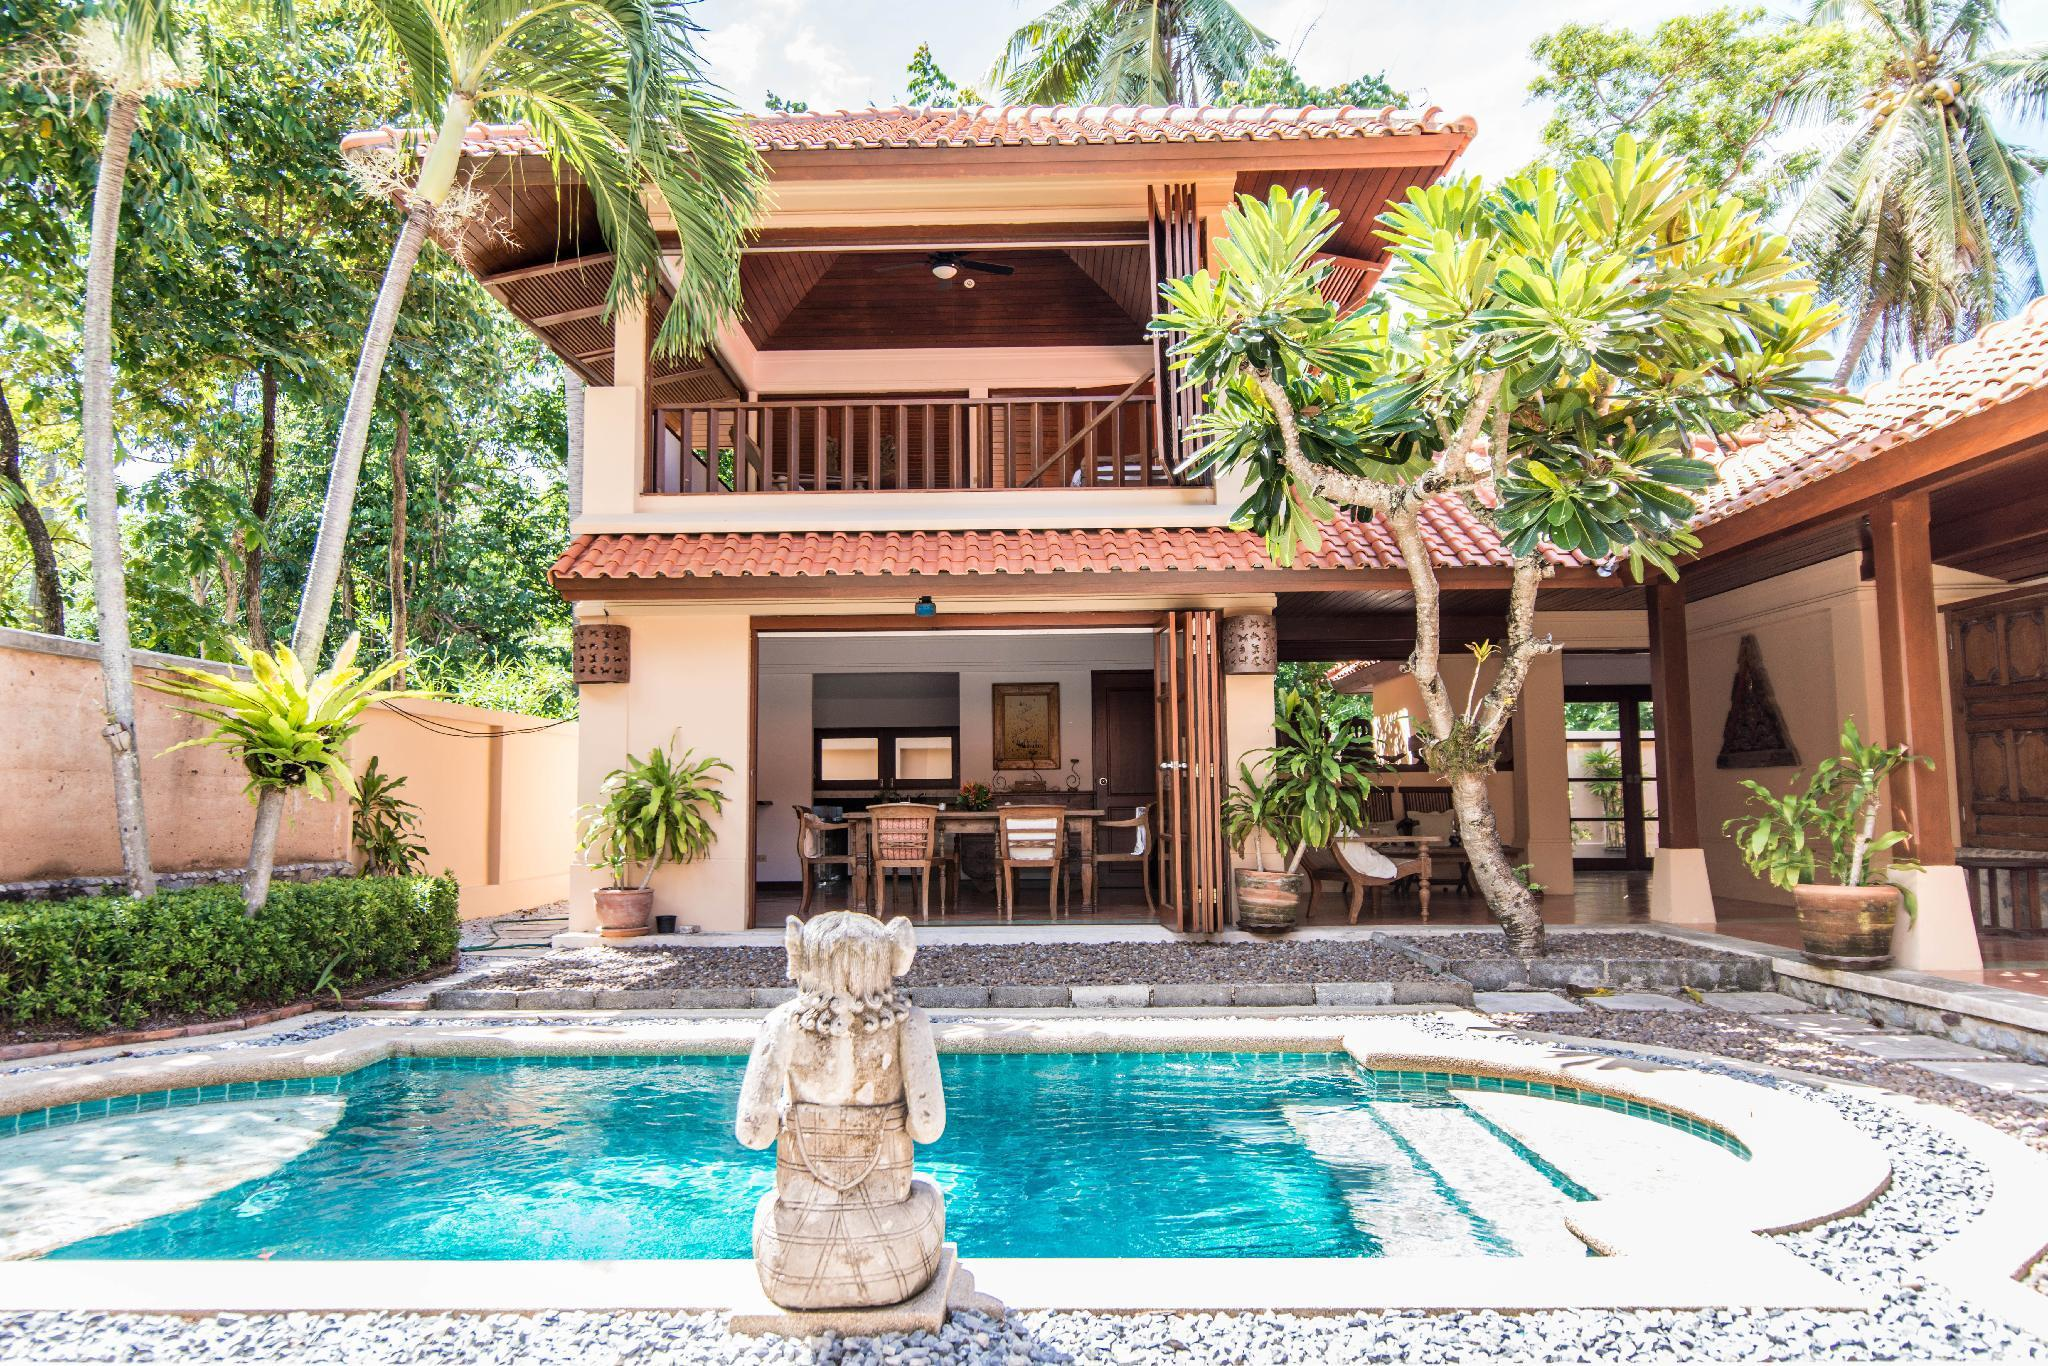 Tamarind Orchid Villa (3BR) Bang Sare, Pattaya วิลลา 3 ห้องนอน 3 ห้องน้ำส่วนตัว ขนาด 200 ตร.ม. – บางสเหร่